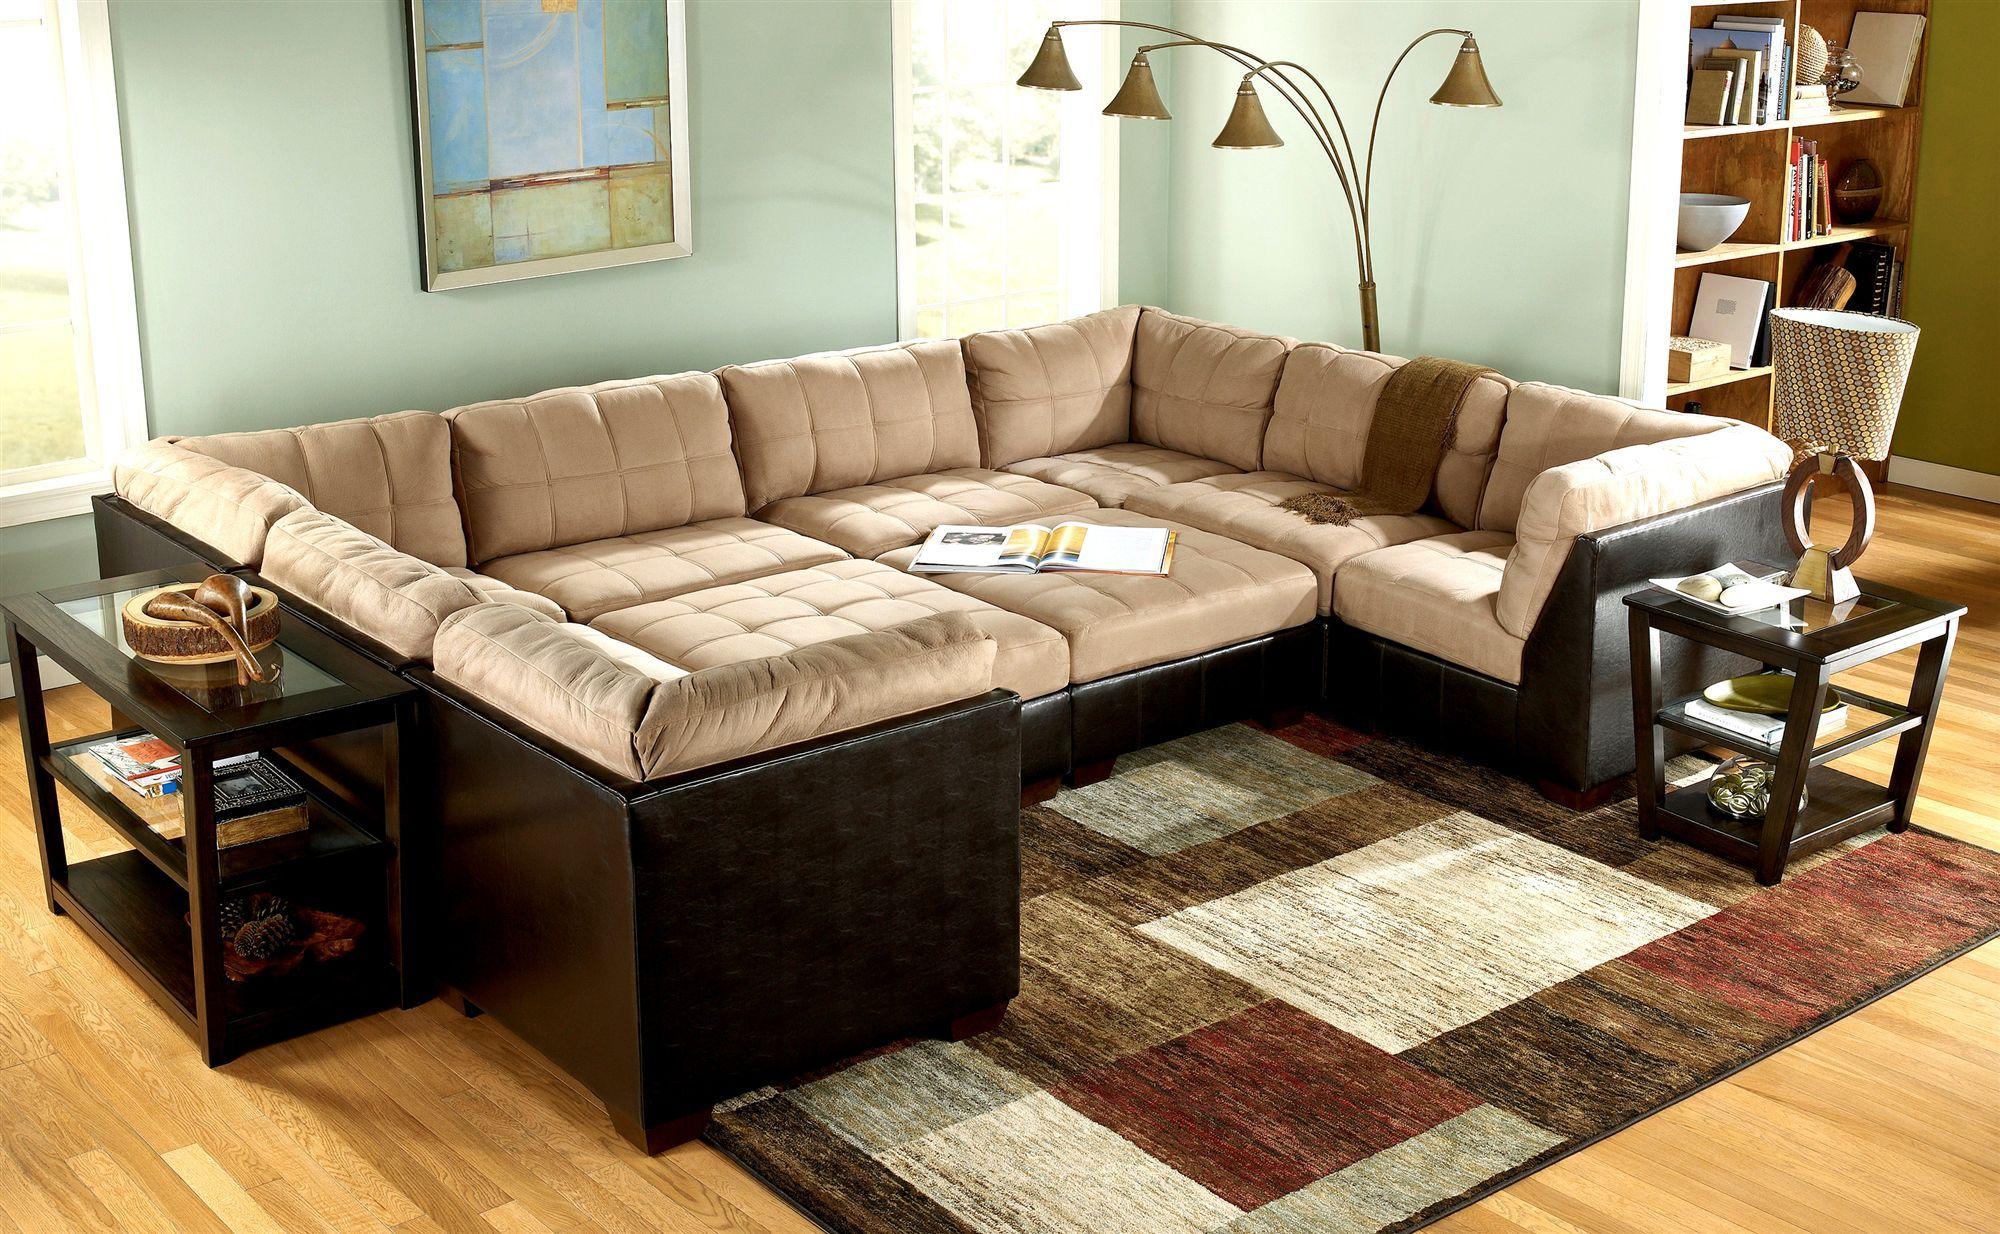 11 Smart Designs Of How To Make 3 Piece Living Room Set Cheap Affordable Living Room Set Couch Design Modular Sectional Sofa